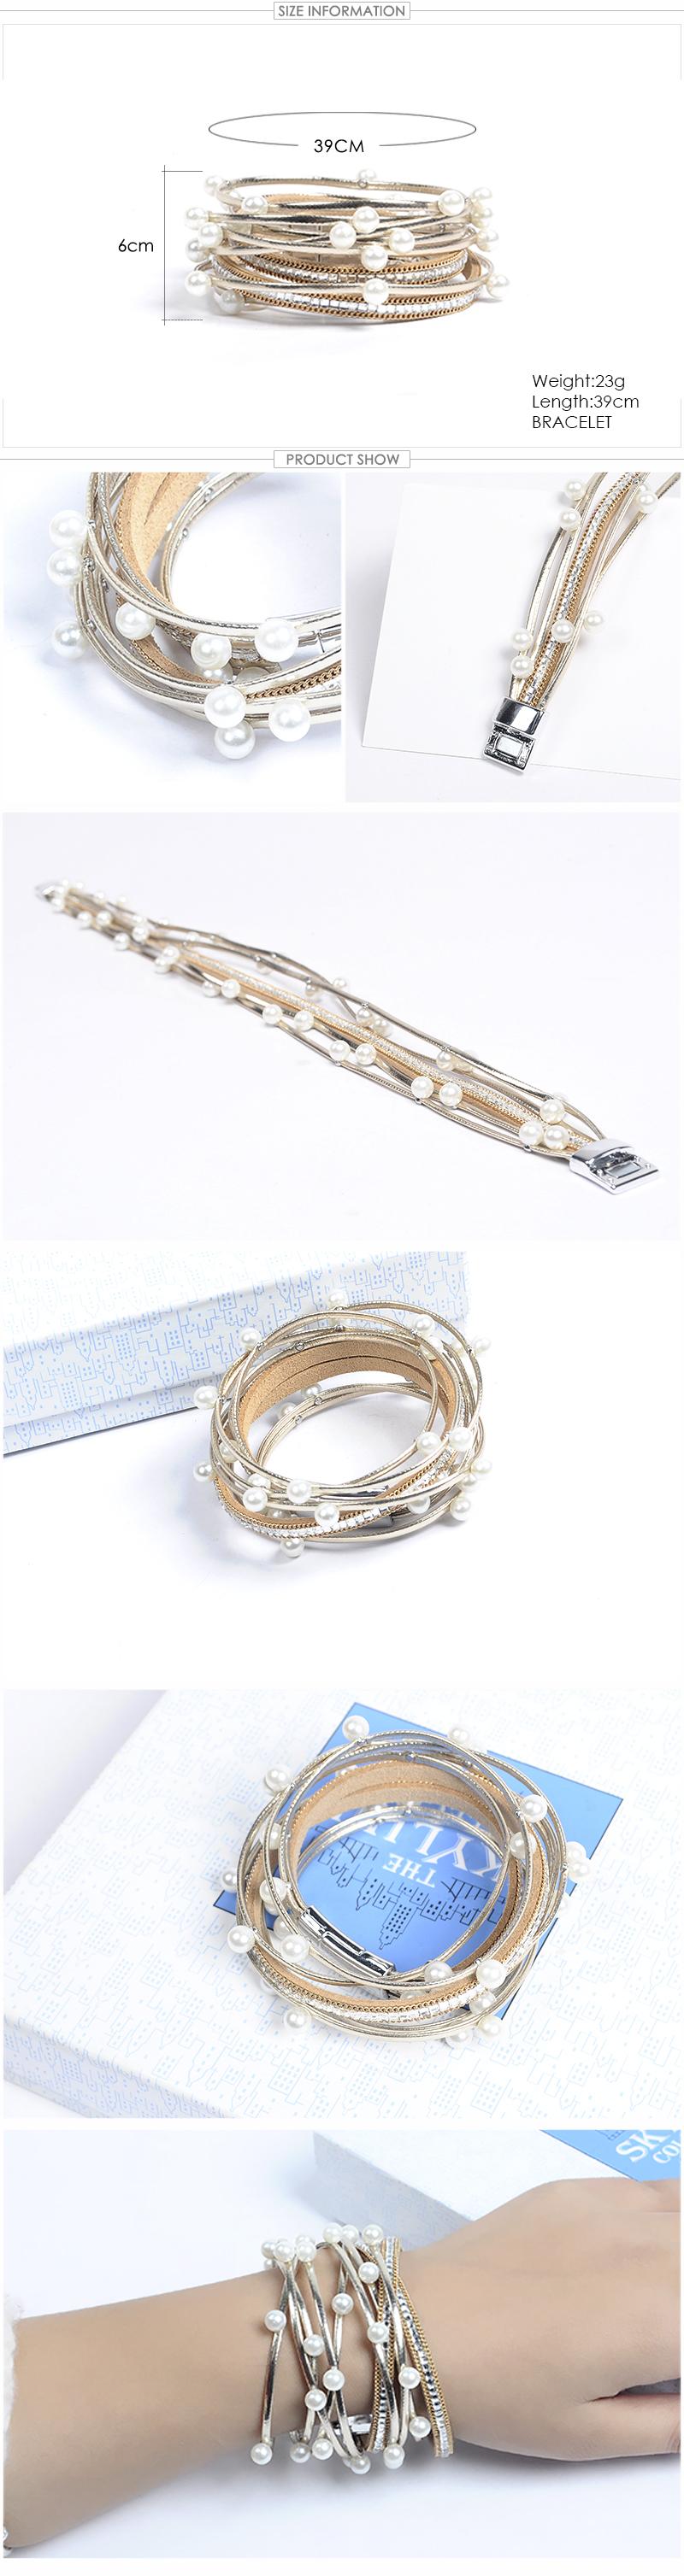 HTB1XmvLfnnI8KJjSszbq6z4KFXaz - Sieraden armband leer met en parels in lagen